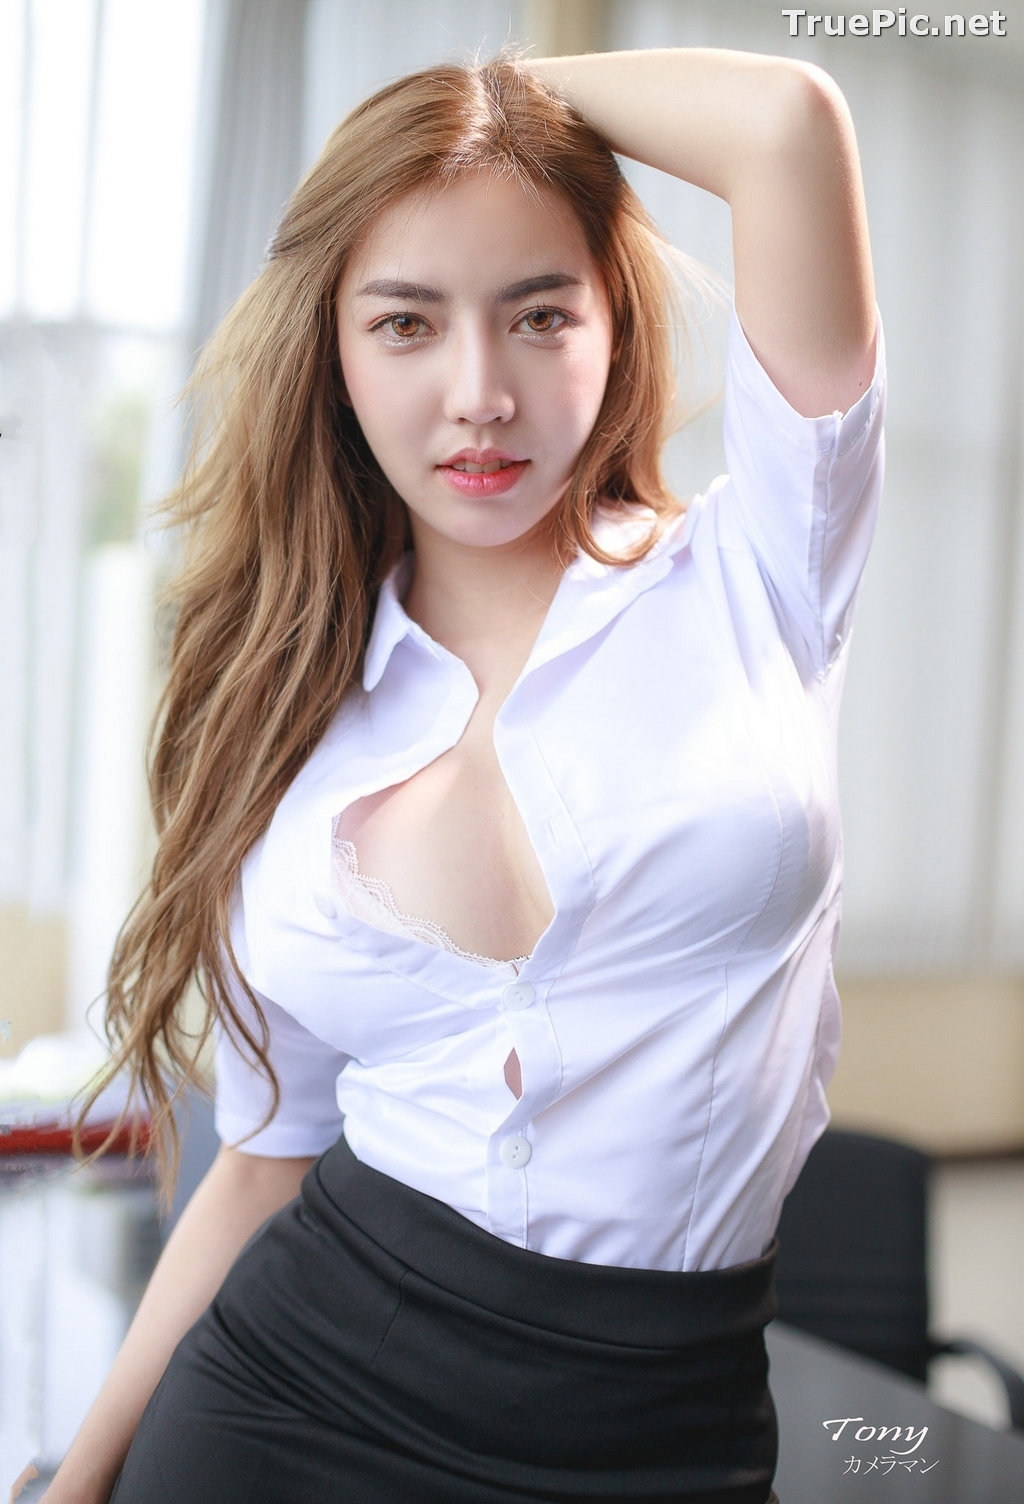 Image Thailand Model - Champ Phawida - Sexy Secretary and Office Uniform - TruePic.net - Picture-8